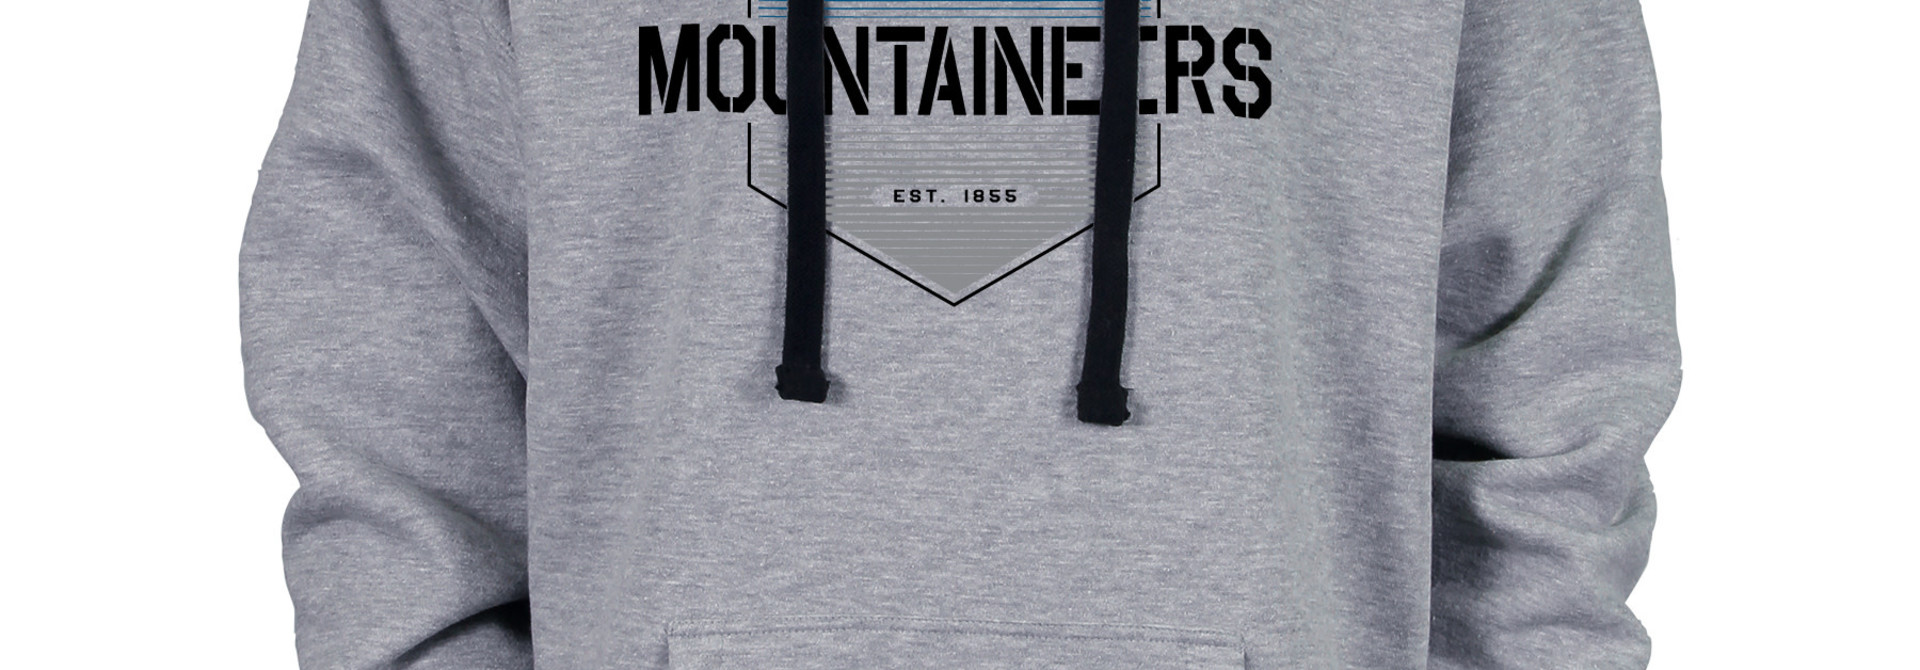 Hexagon BC Mountaineers Est. 1855 Hoodie